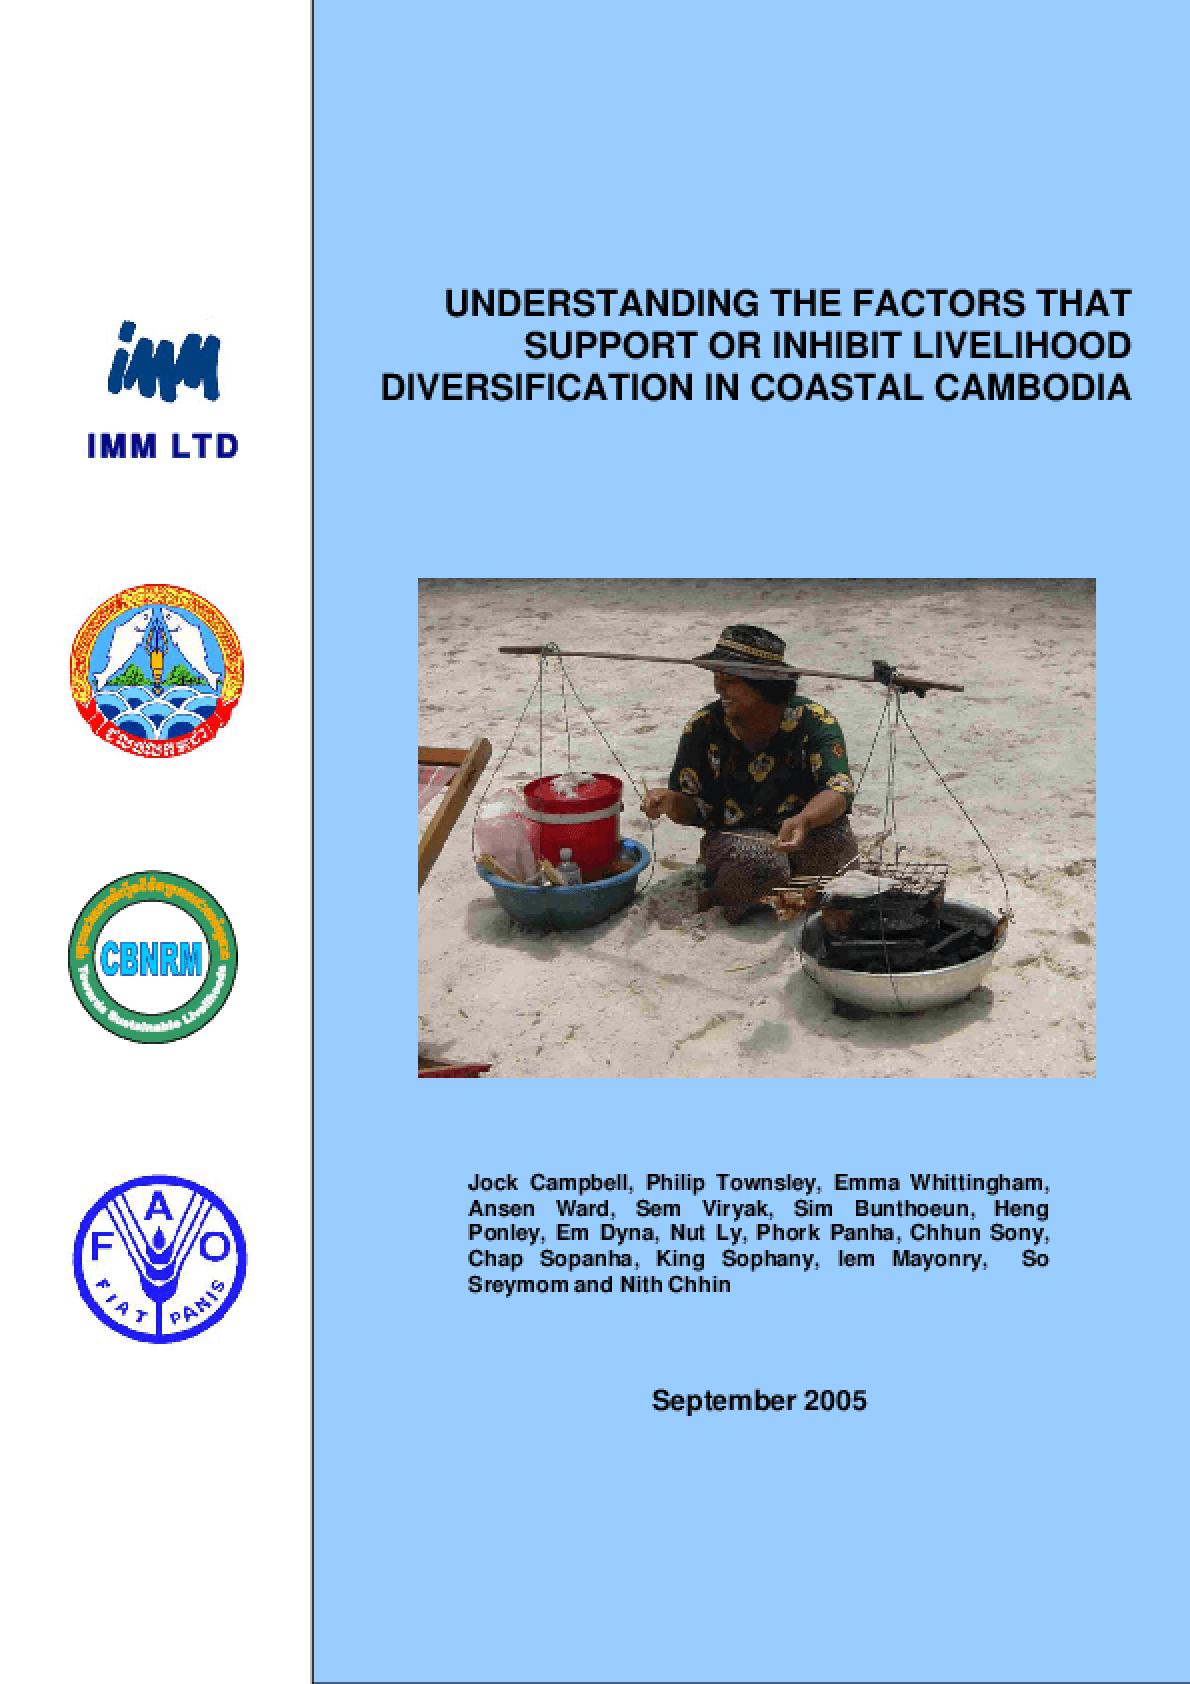 Understanding the Factors that Support or Inhibit Livelihood Diversification in Coastal Cambodia